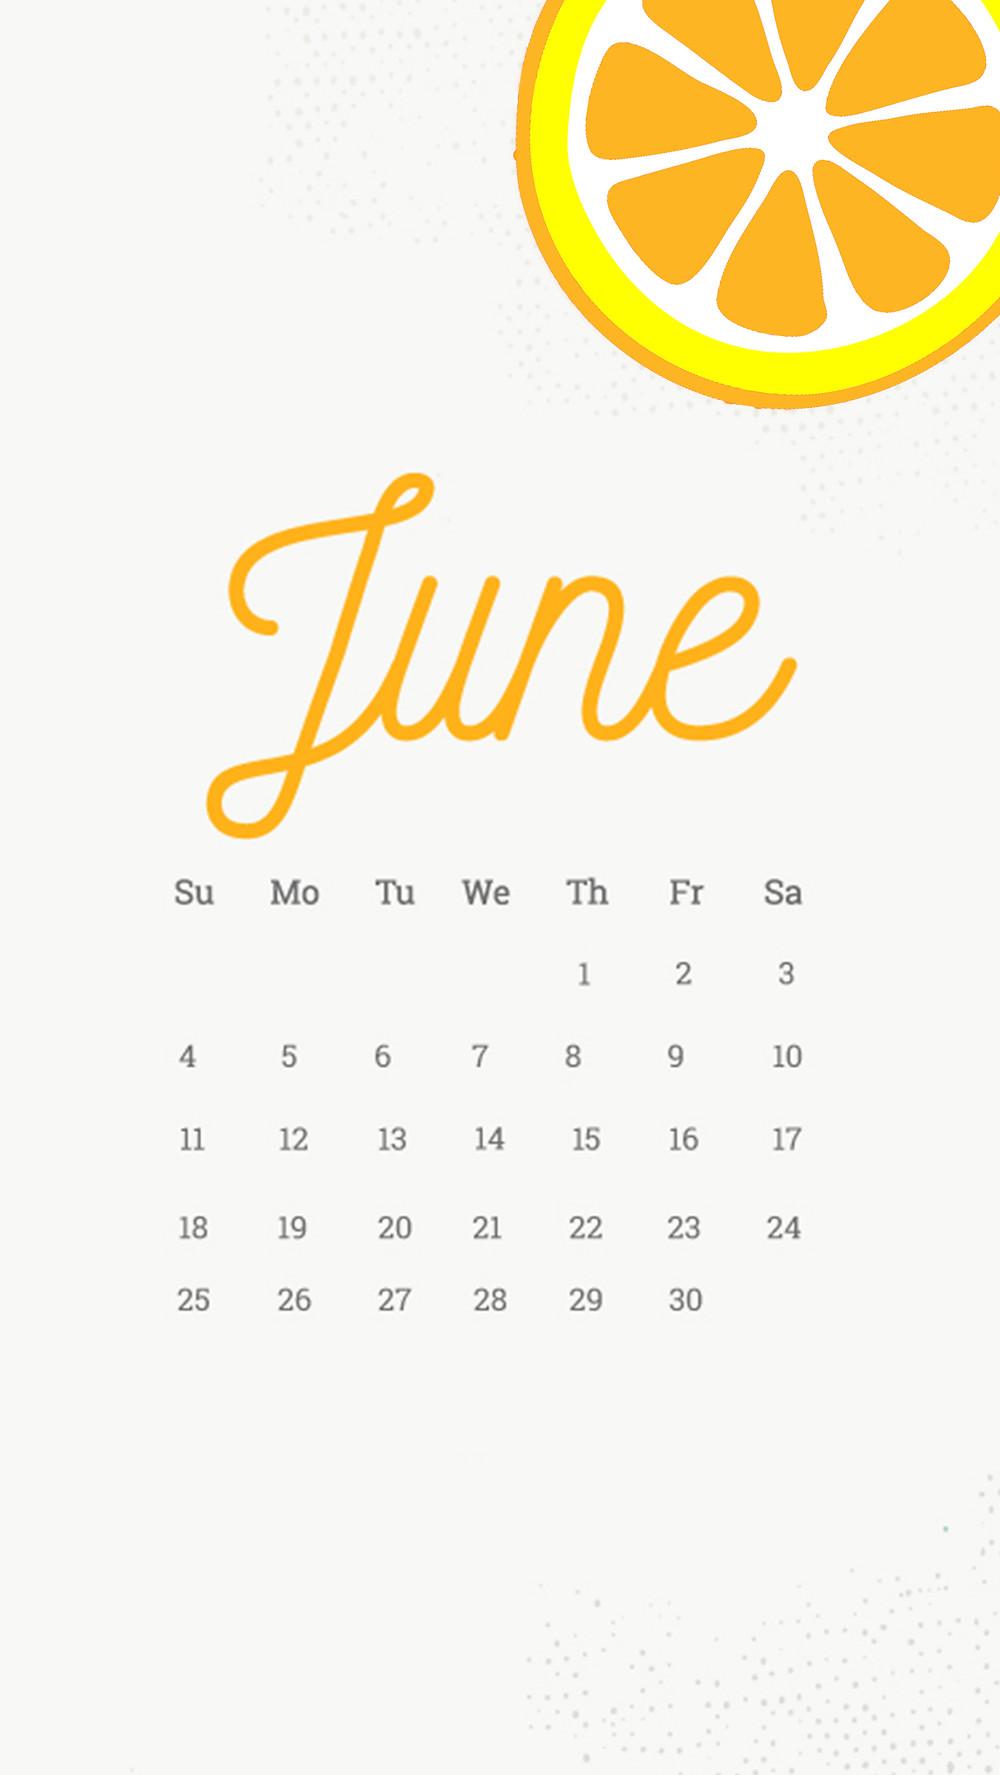 june citrus calendar tech phone and desktop background wallpaper free download